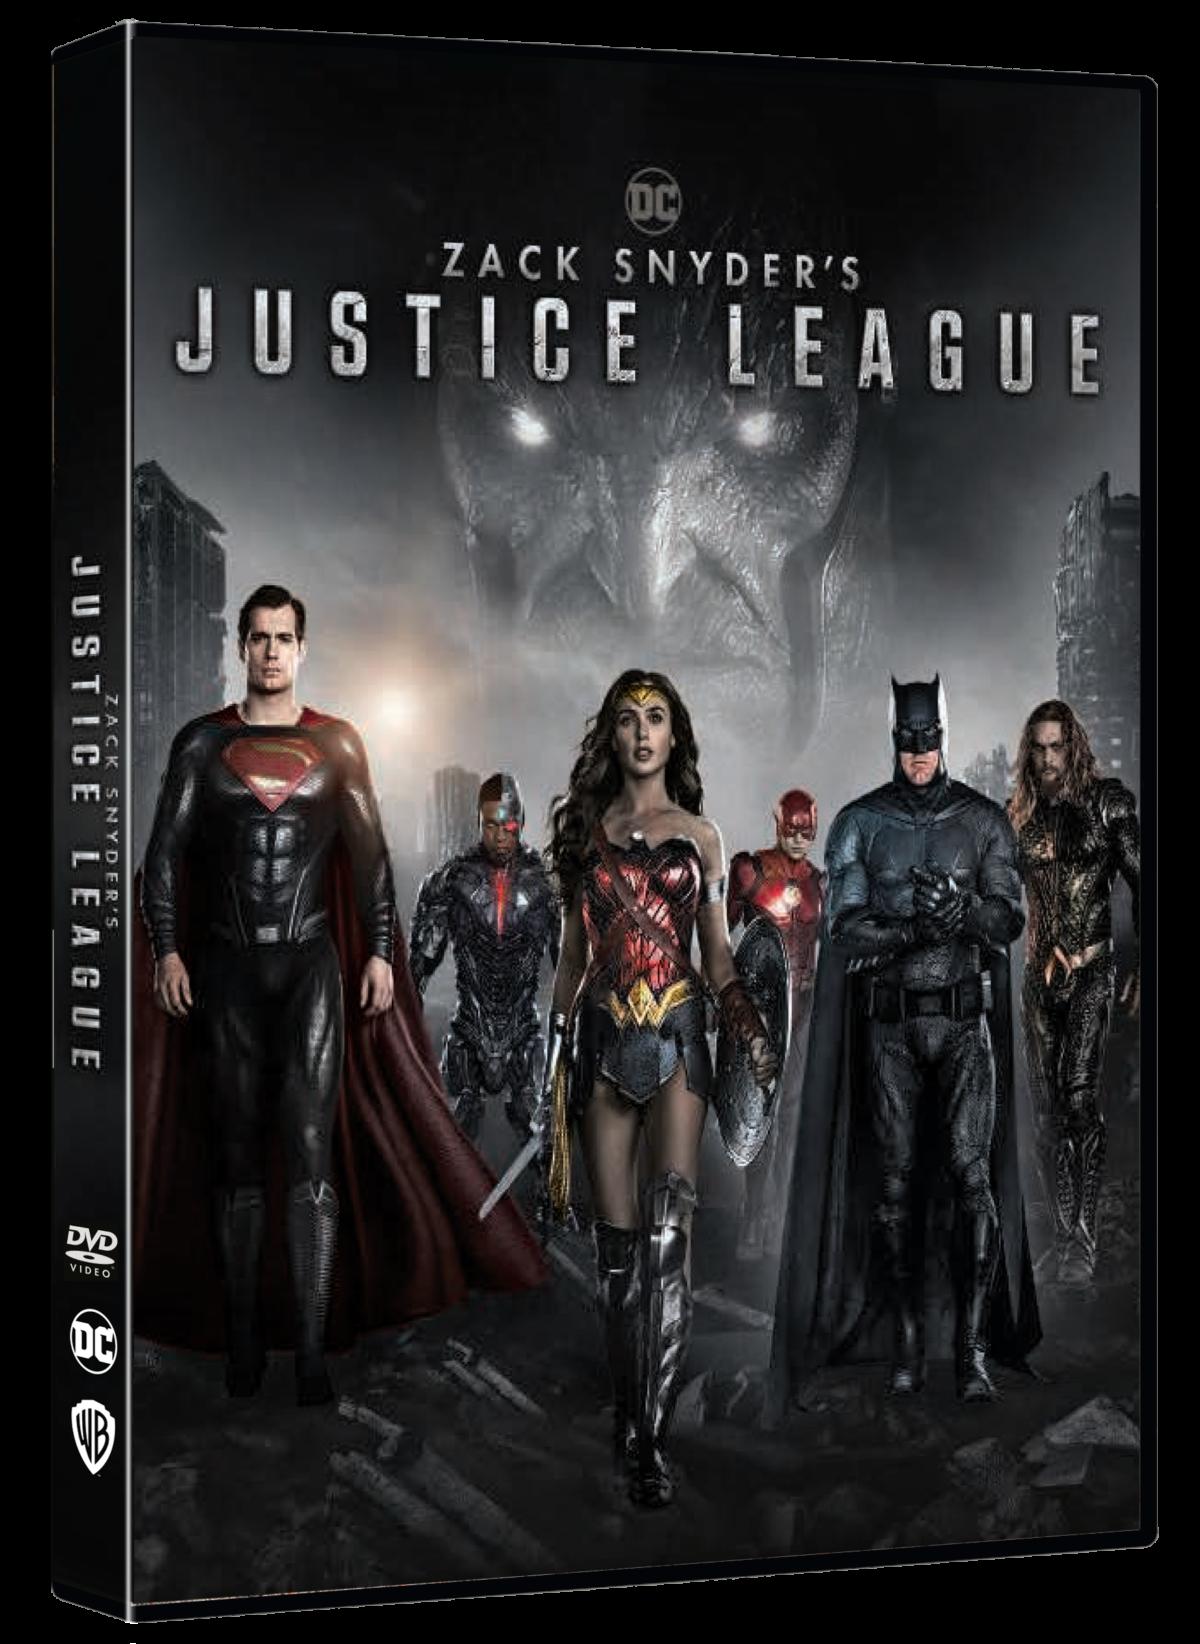 DVD_Zack_Snyder_Justice_League